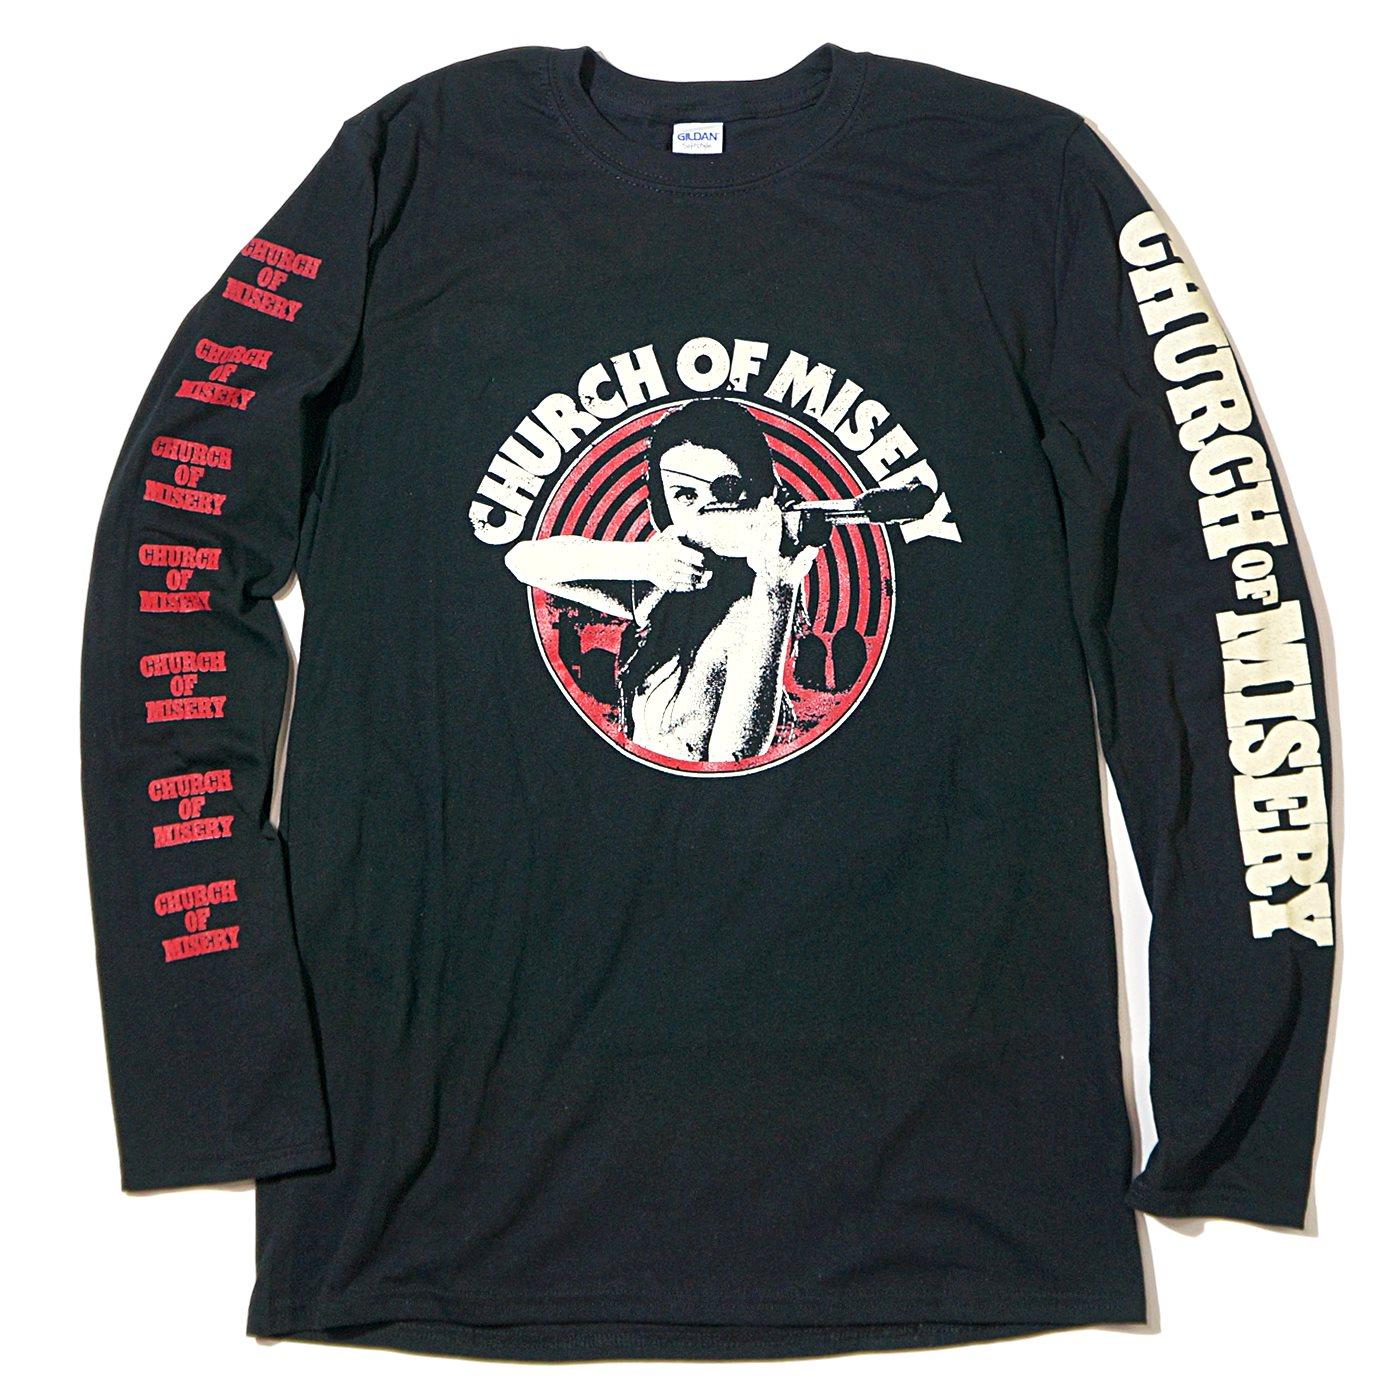 CHURCH OF MISERY ロングスリーブTシャツ One Eye-Black